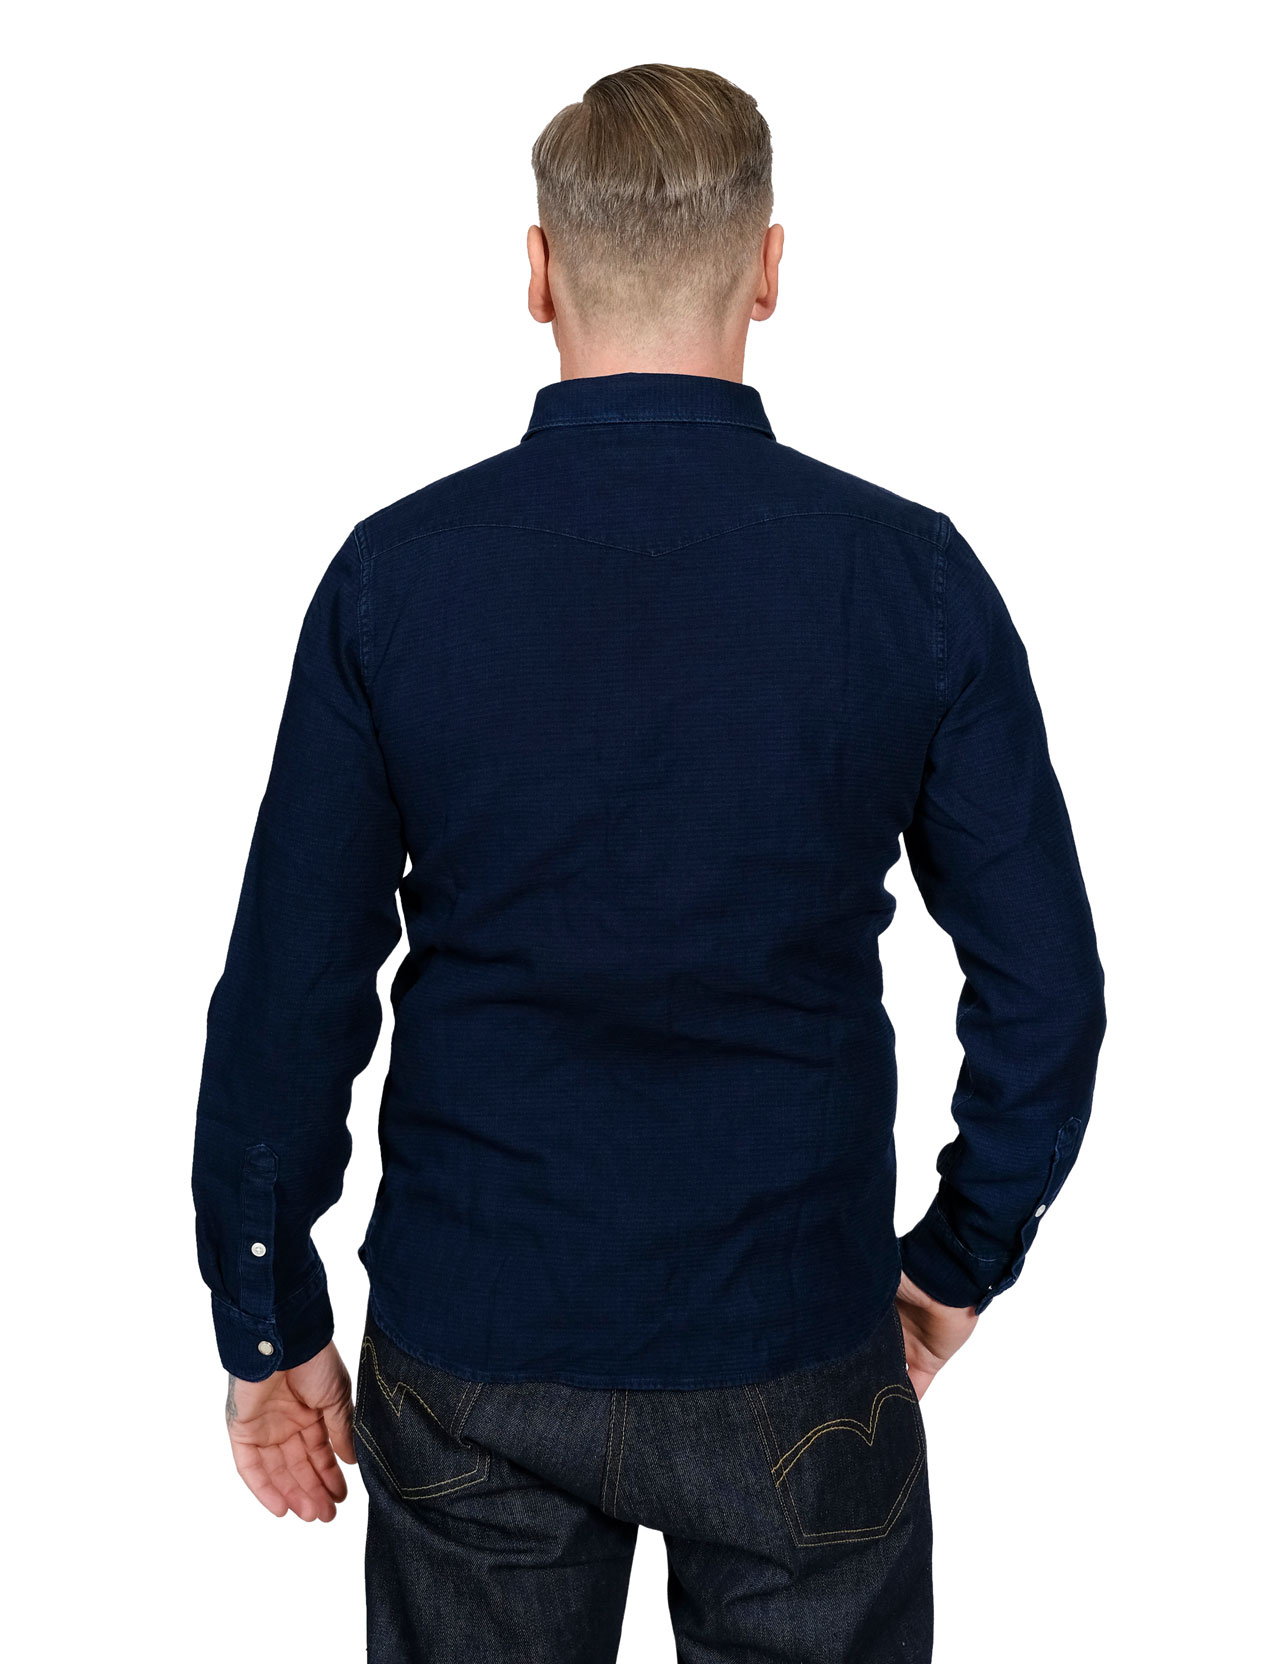 Lee - 101 Premium Western Shirt - Indigo 059164951dabb